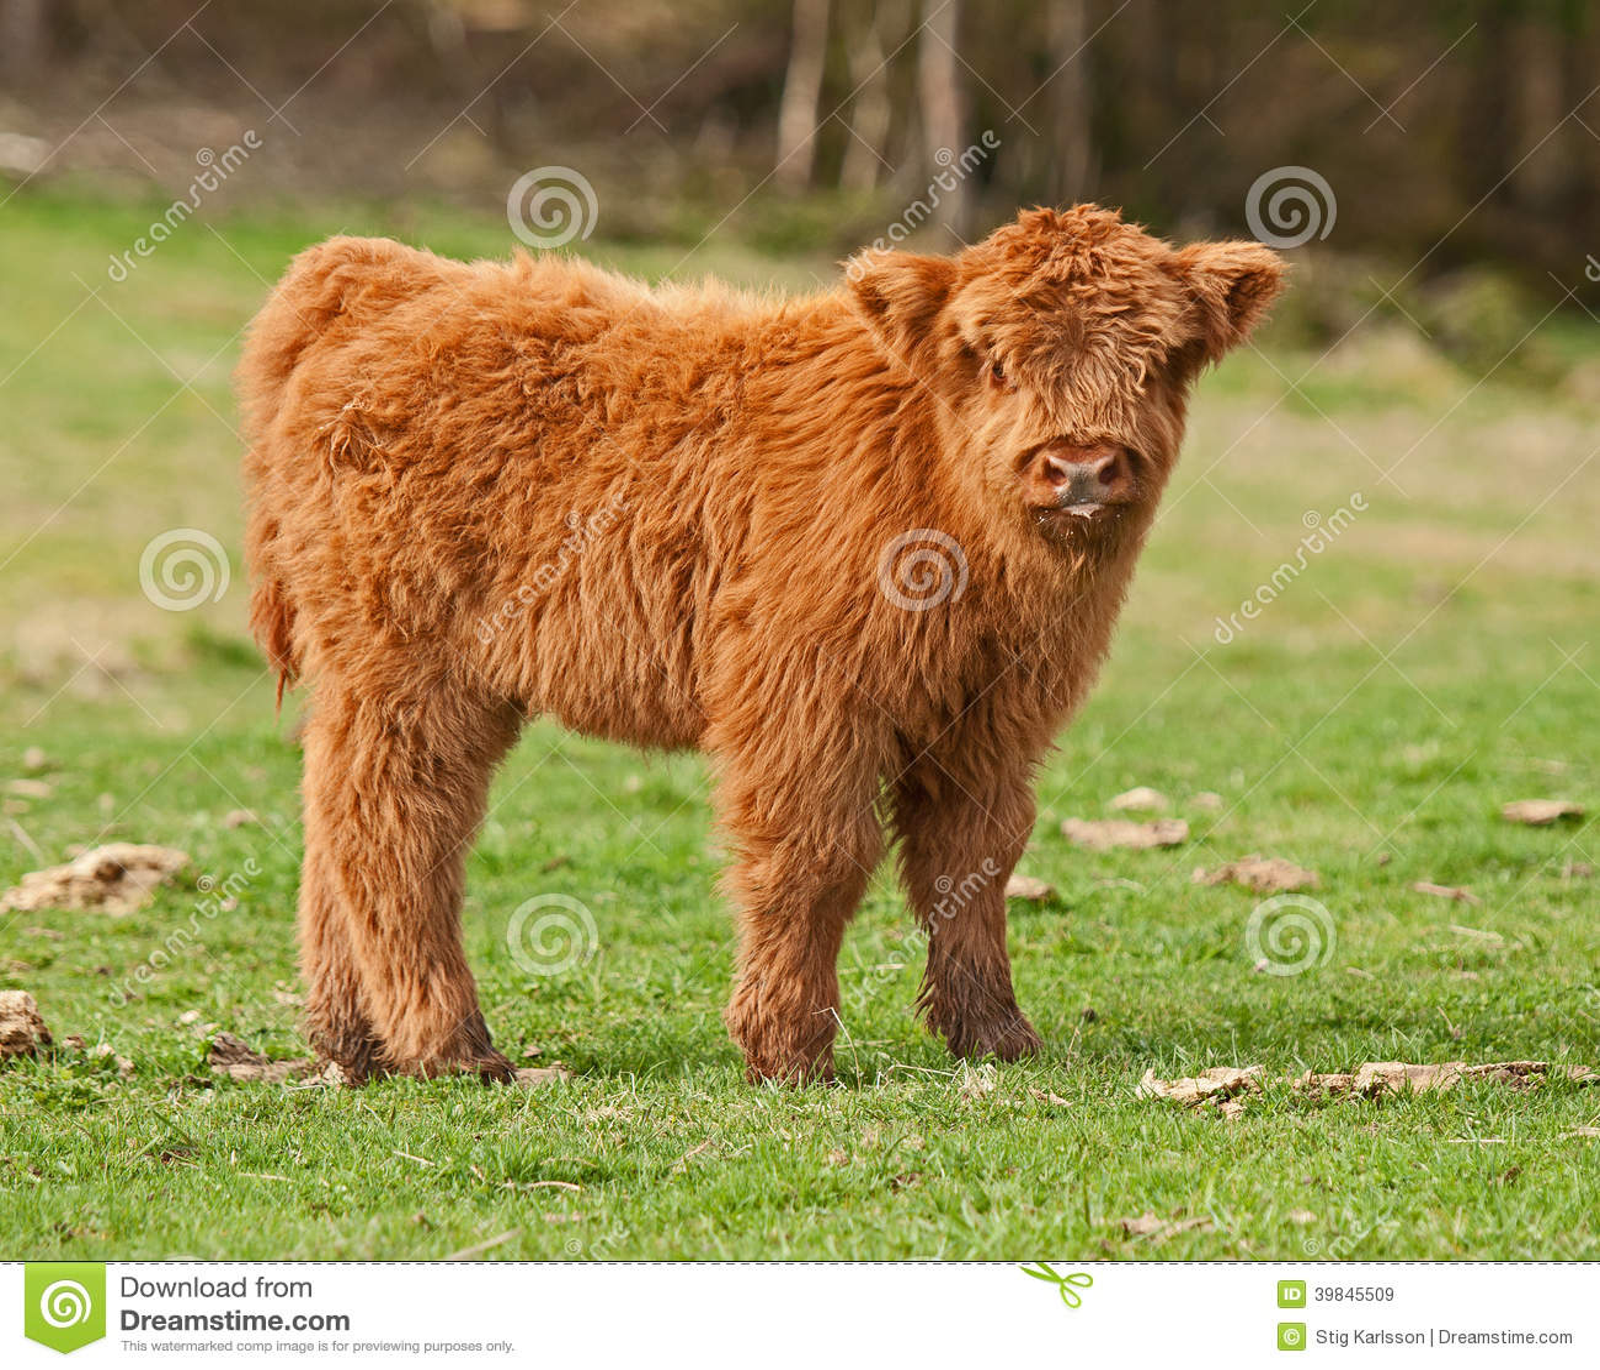 cute fluffy baby cow